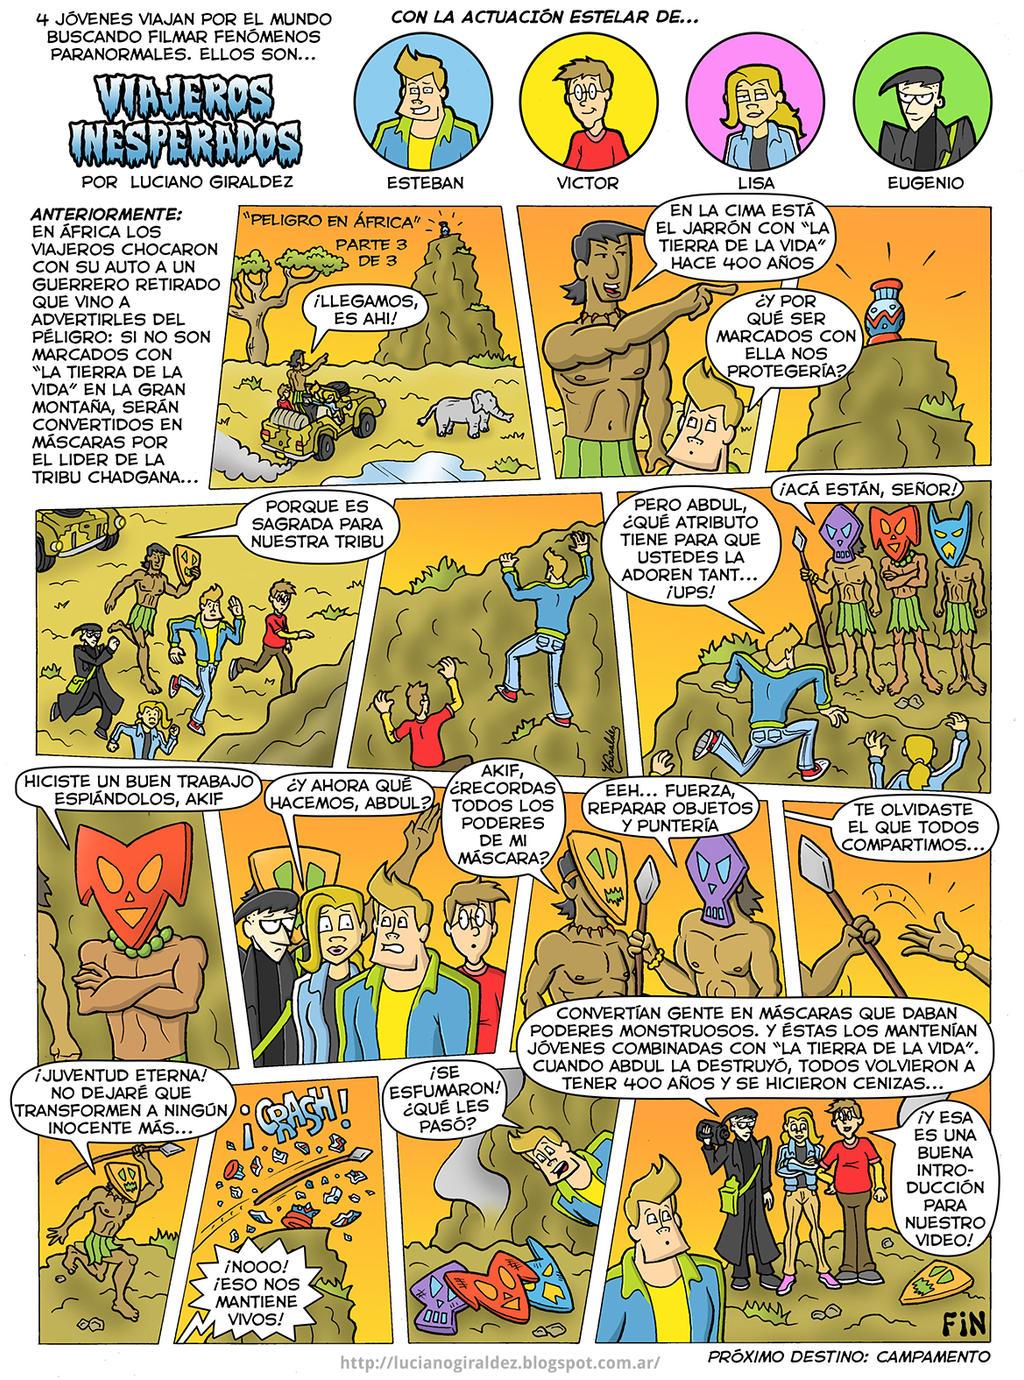 Viajeros inesperados - Peligro en Africa 3